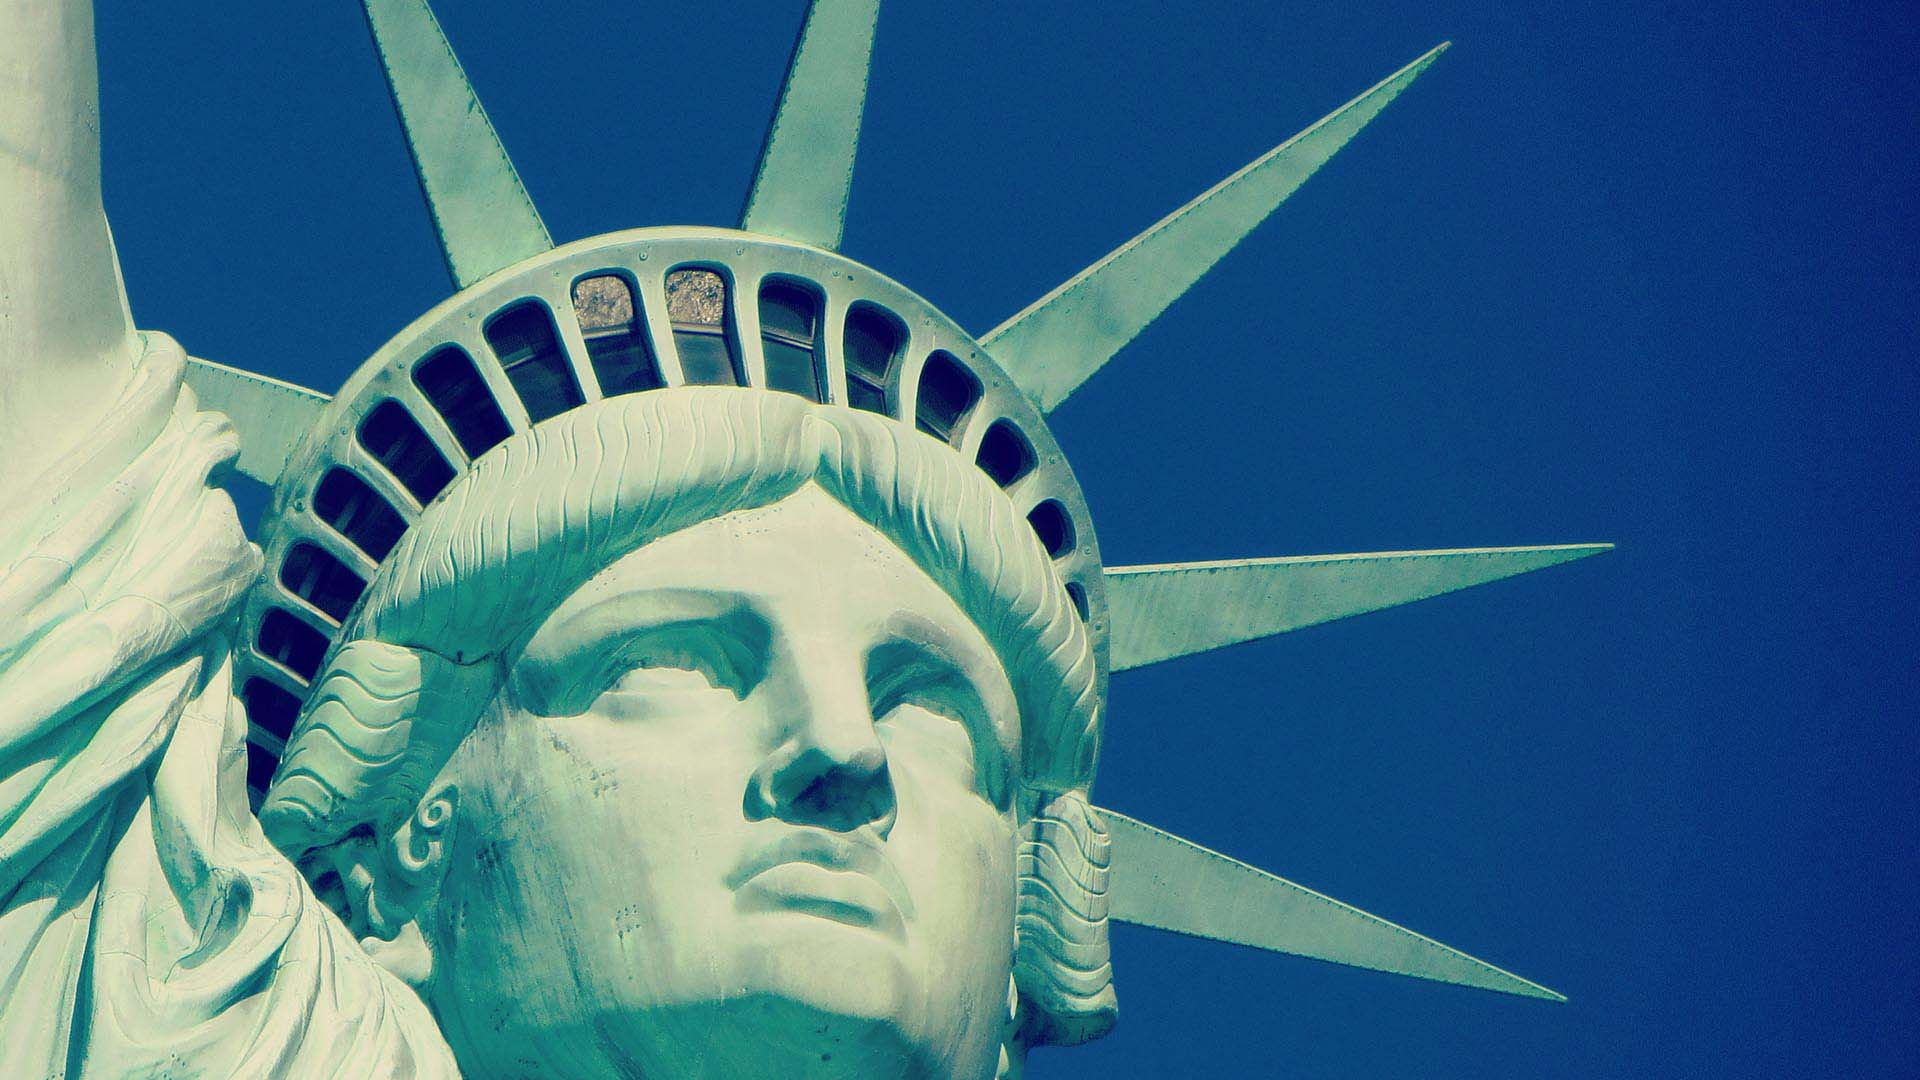 statue-of-liberty-267948